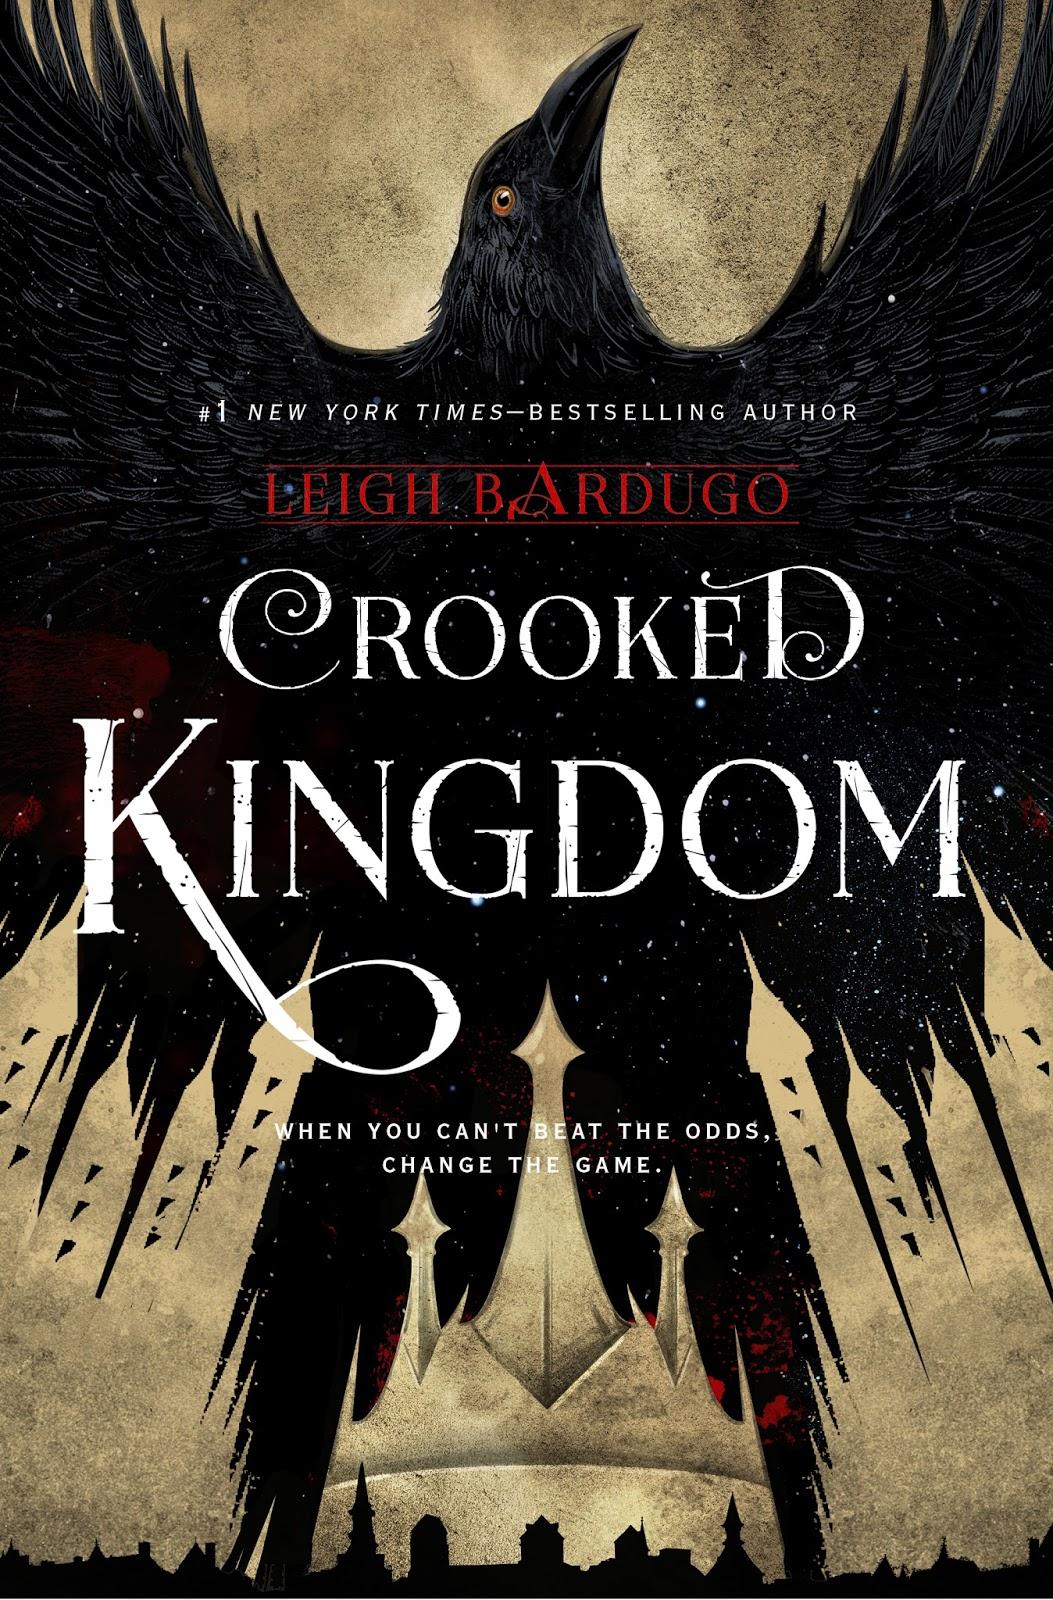 Crooked kingdom audiobook vk